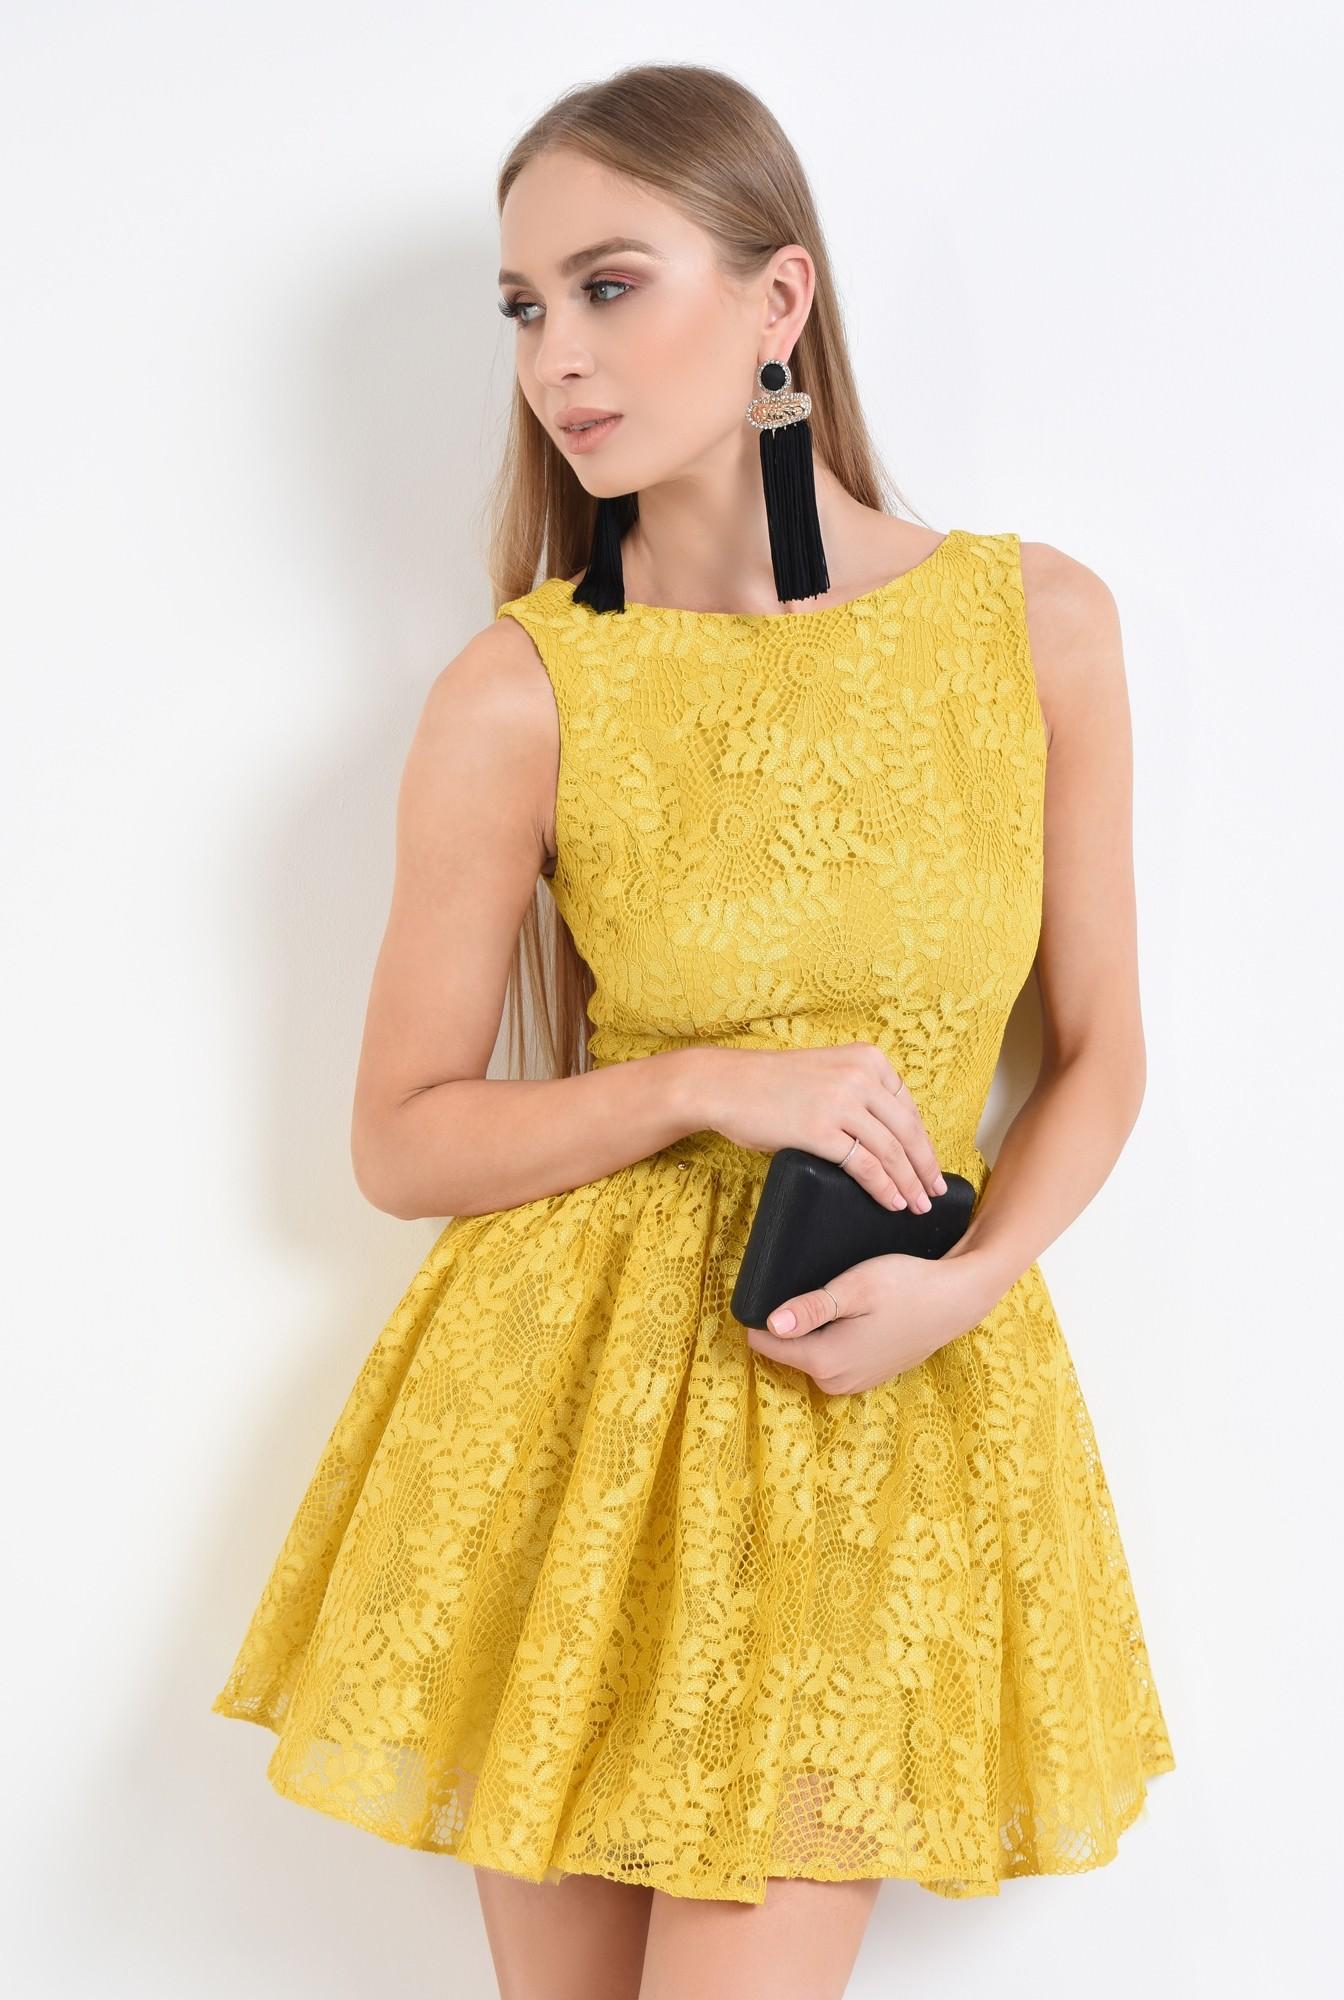 0 - 360 - rochie de seara, dantela galbena, cloche, rochii online